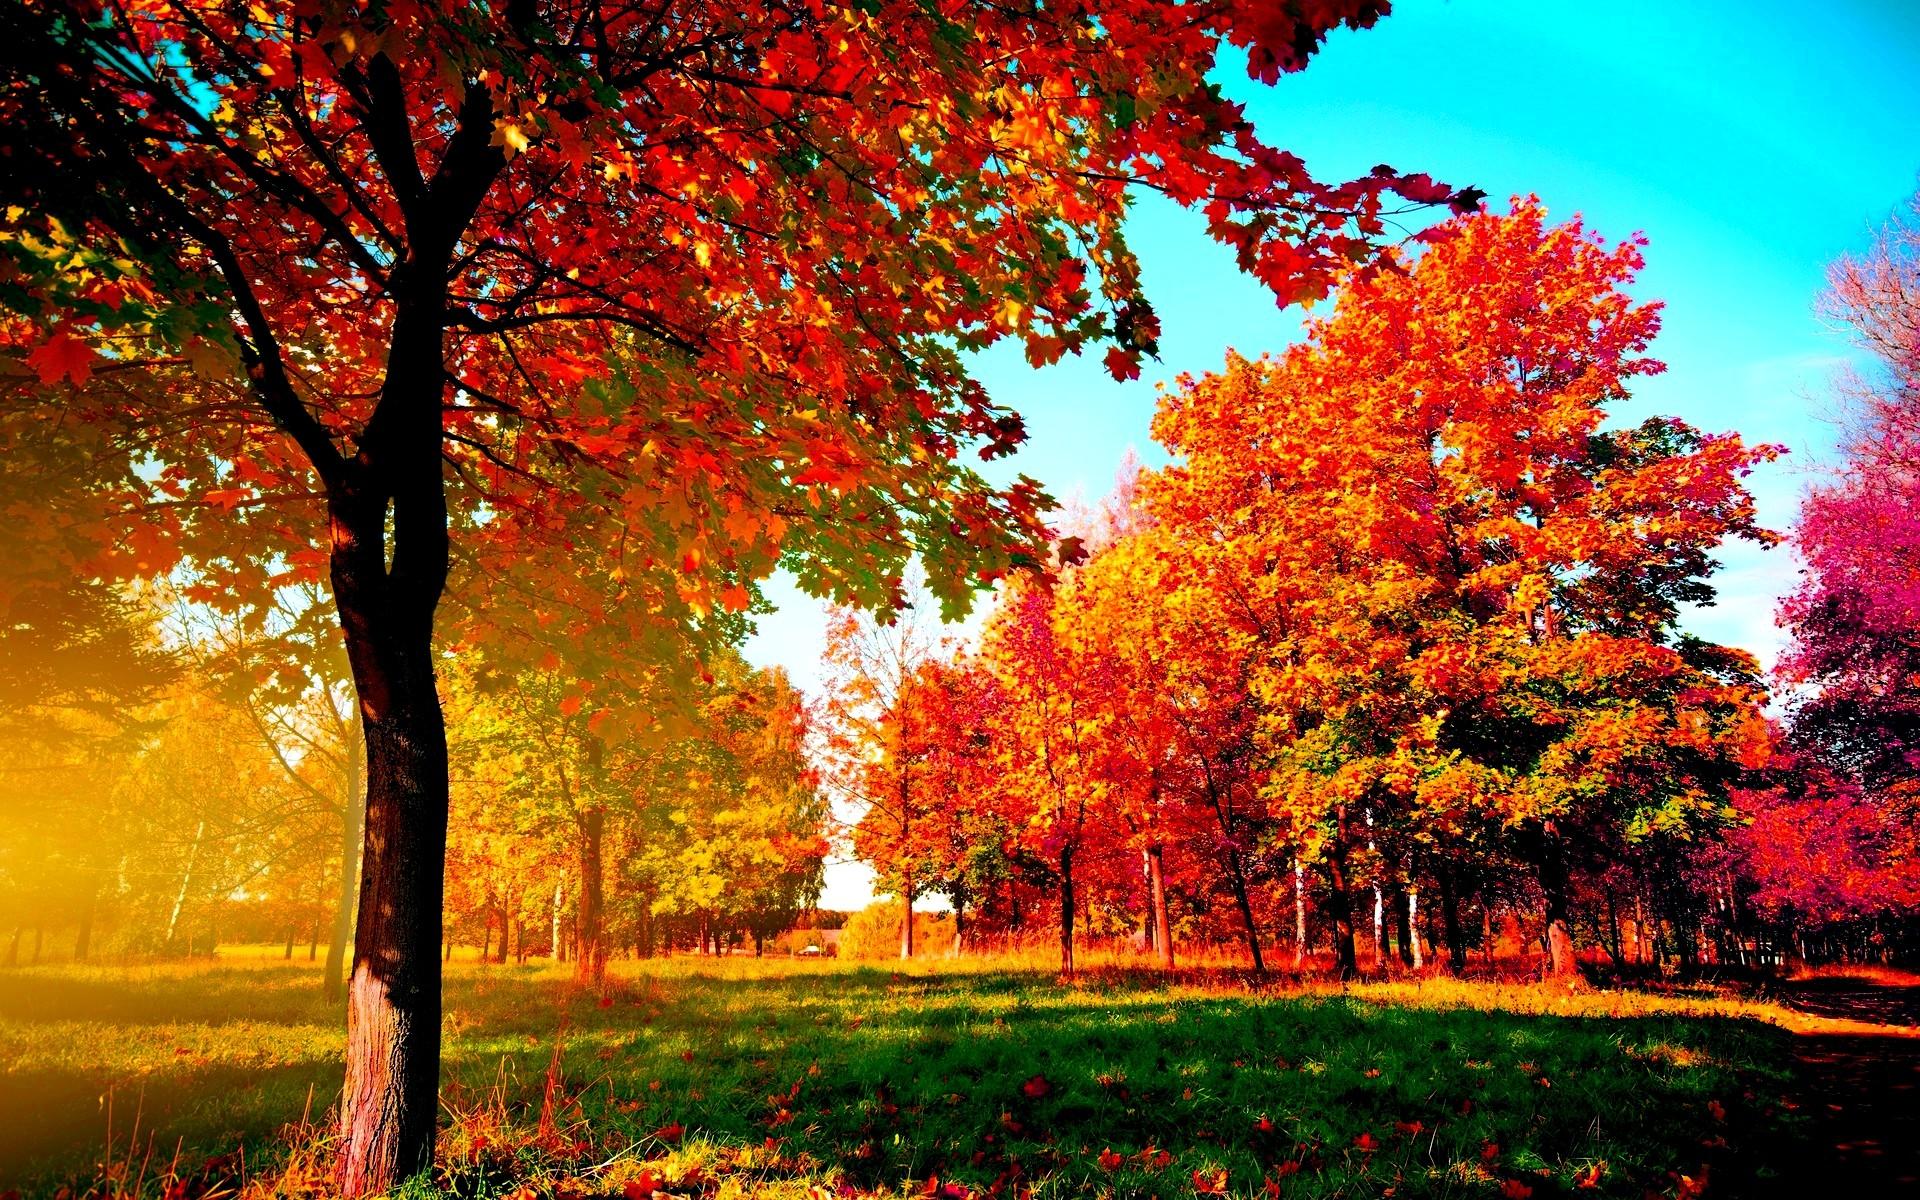 Free Autumn Desktop Wallpaper Backgrounds